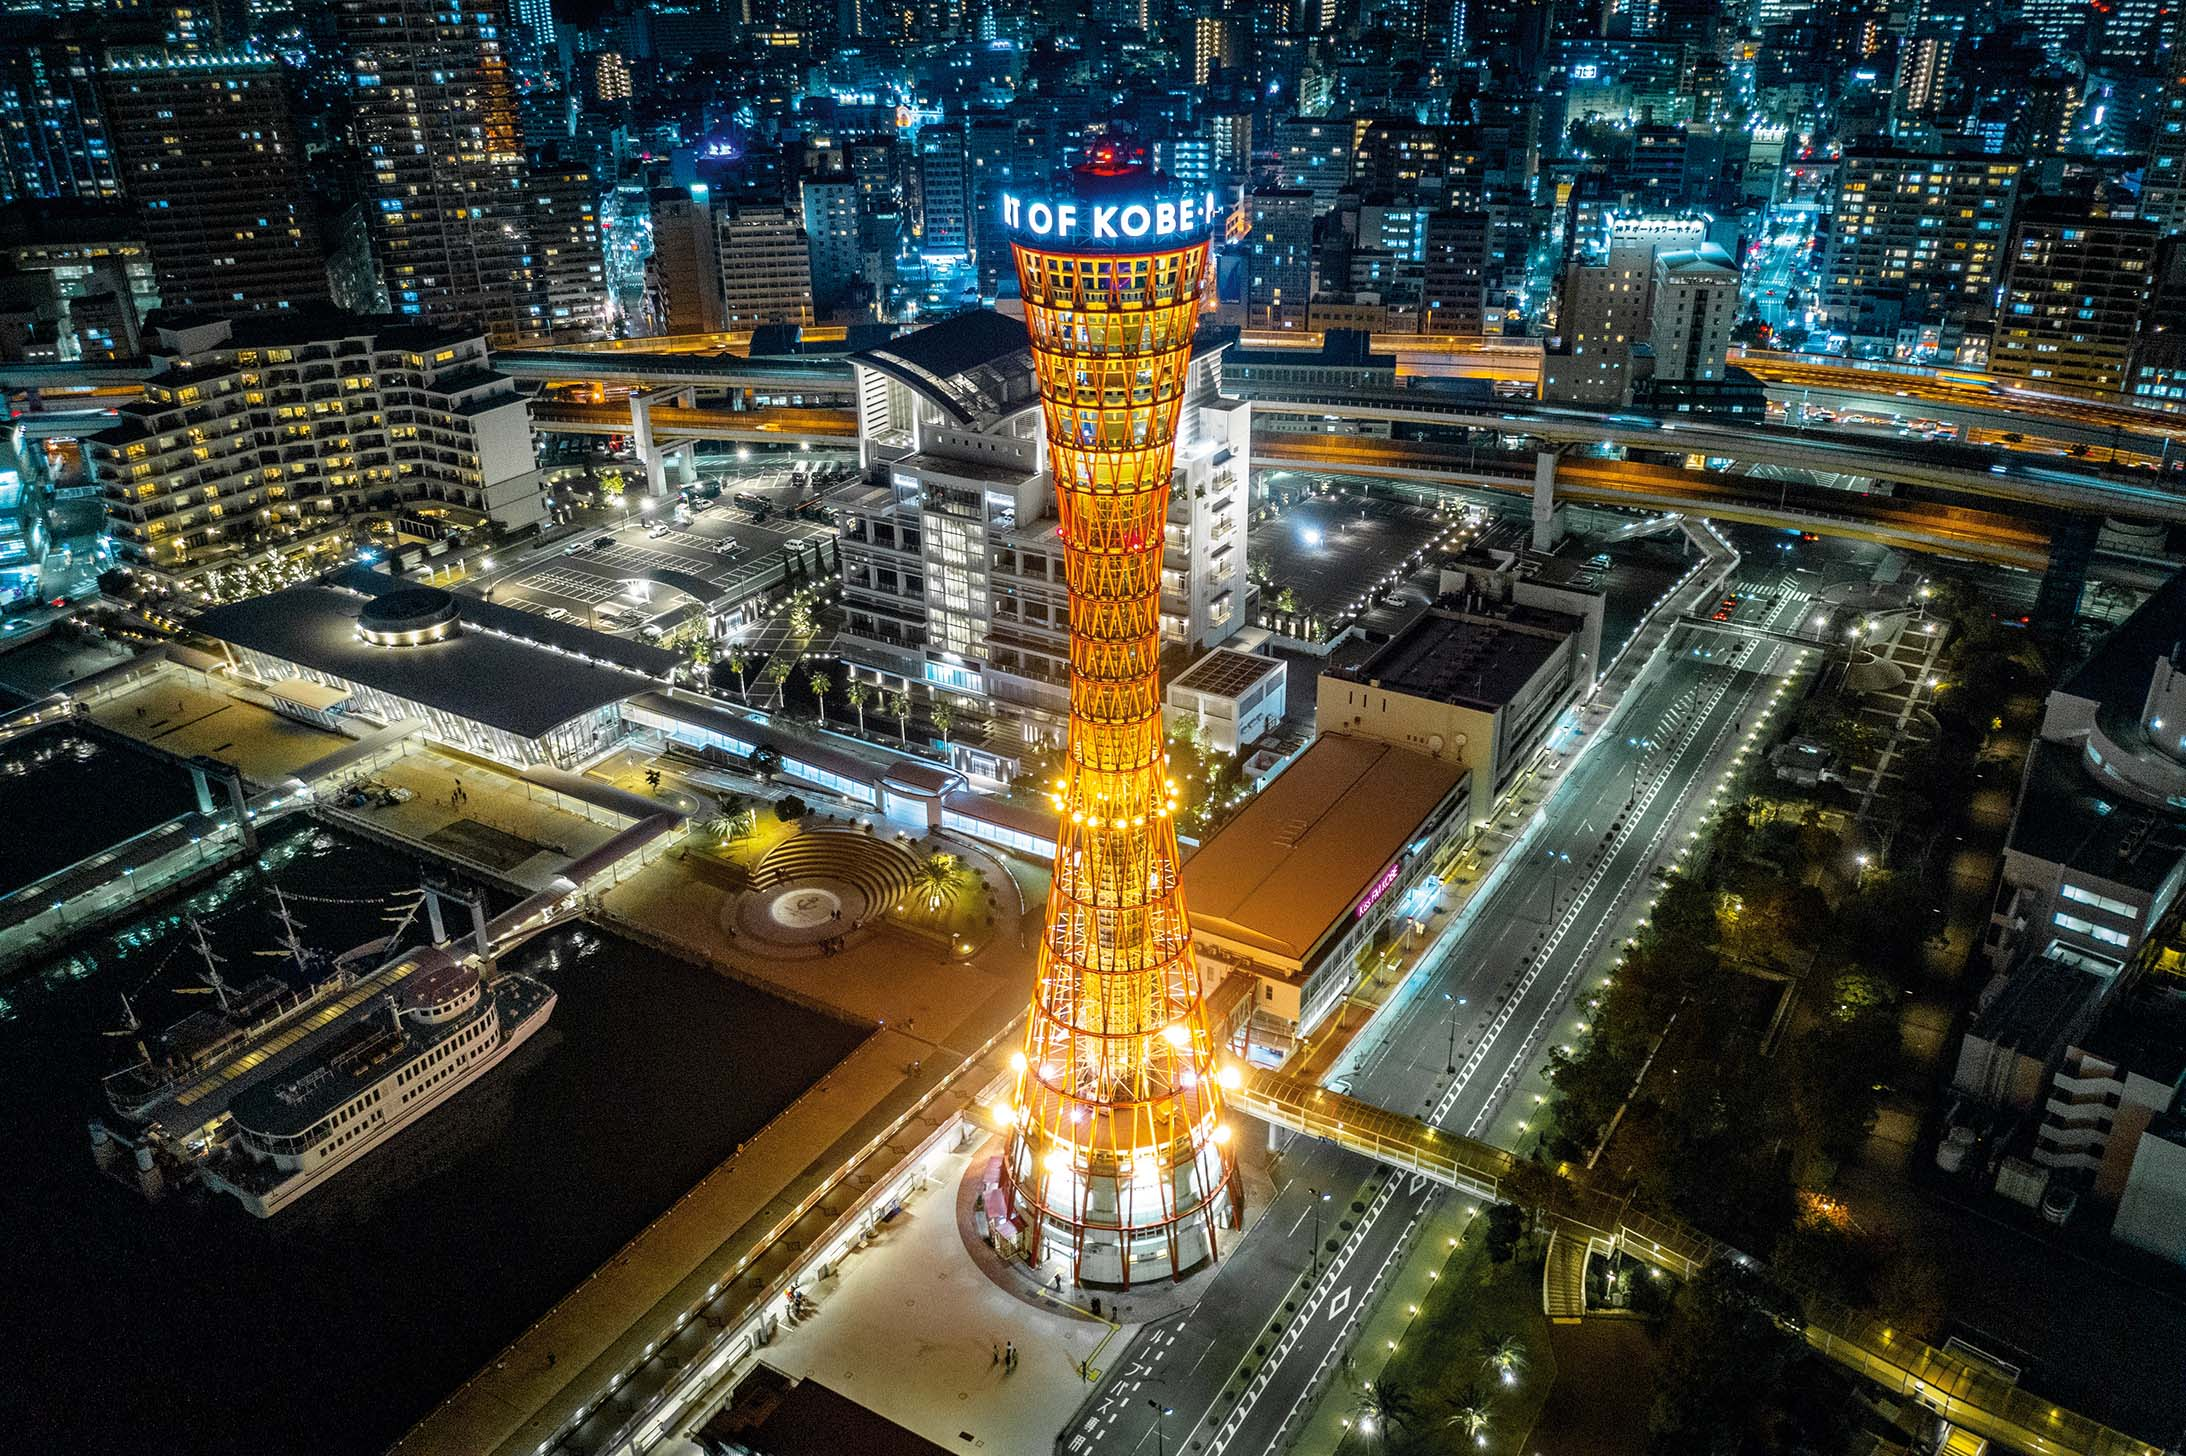 Aerial view down towards the Kobe Port Tower and Kobe Harbor Cityscape. Drone point of view. Nightshot with orange illuminated Kobe Tower. Kobe, Japan, Asia.